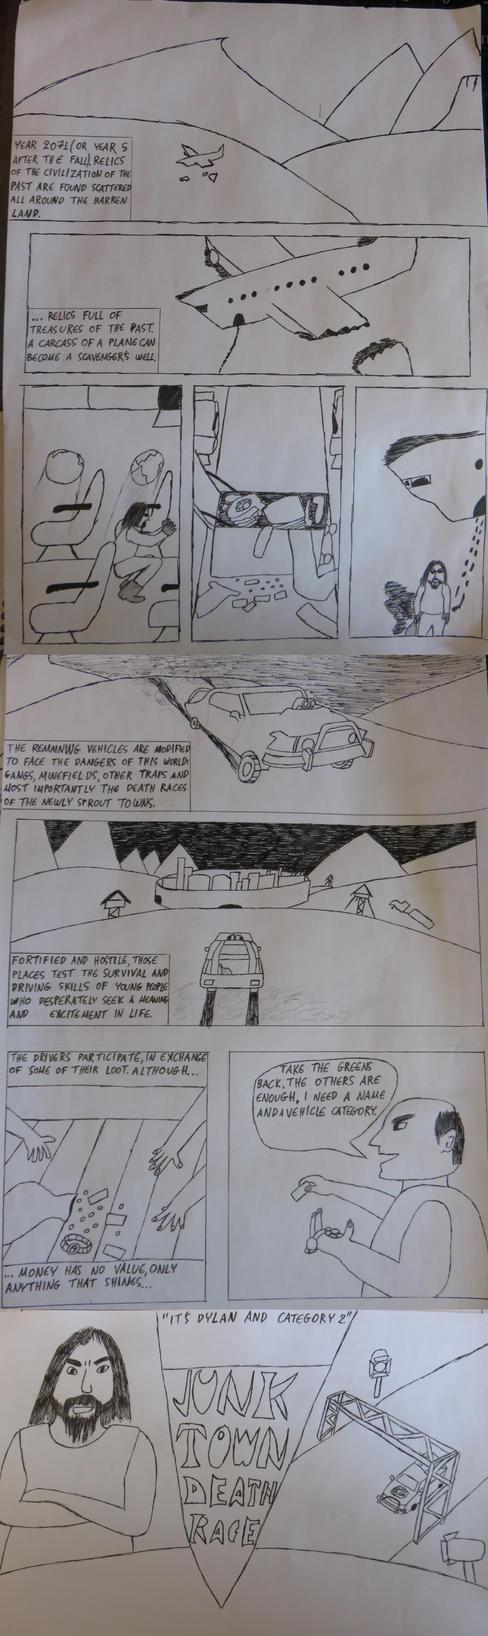 Short Mad Max based comic by wastelander-nick